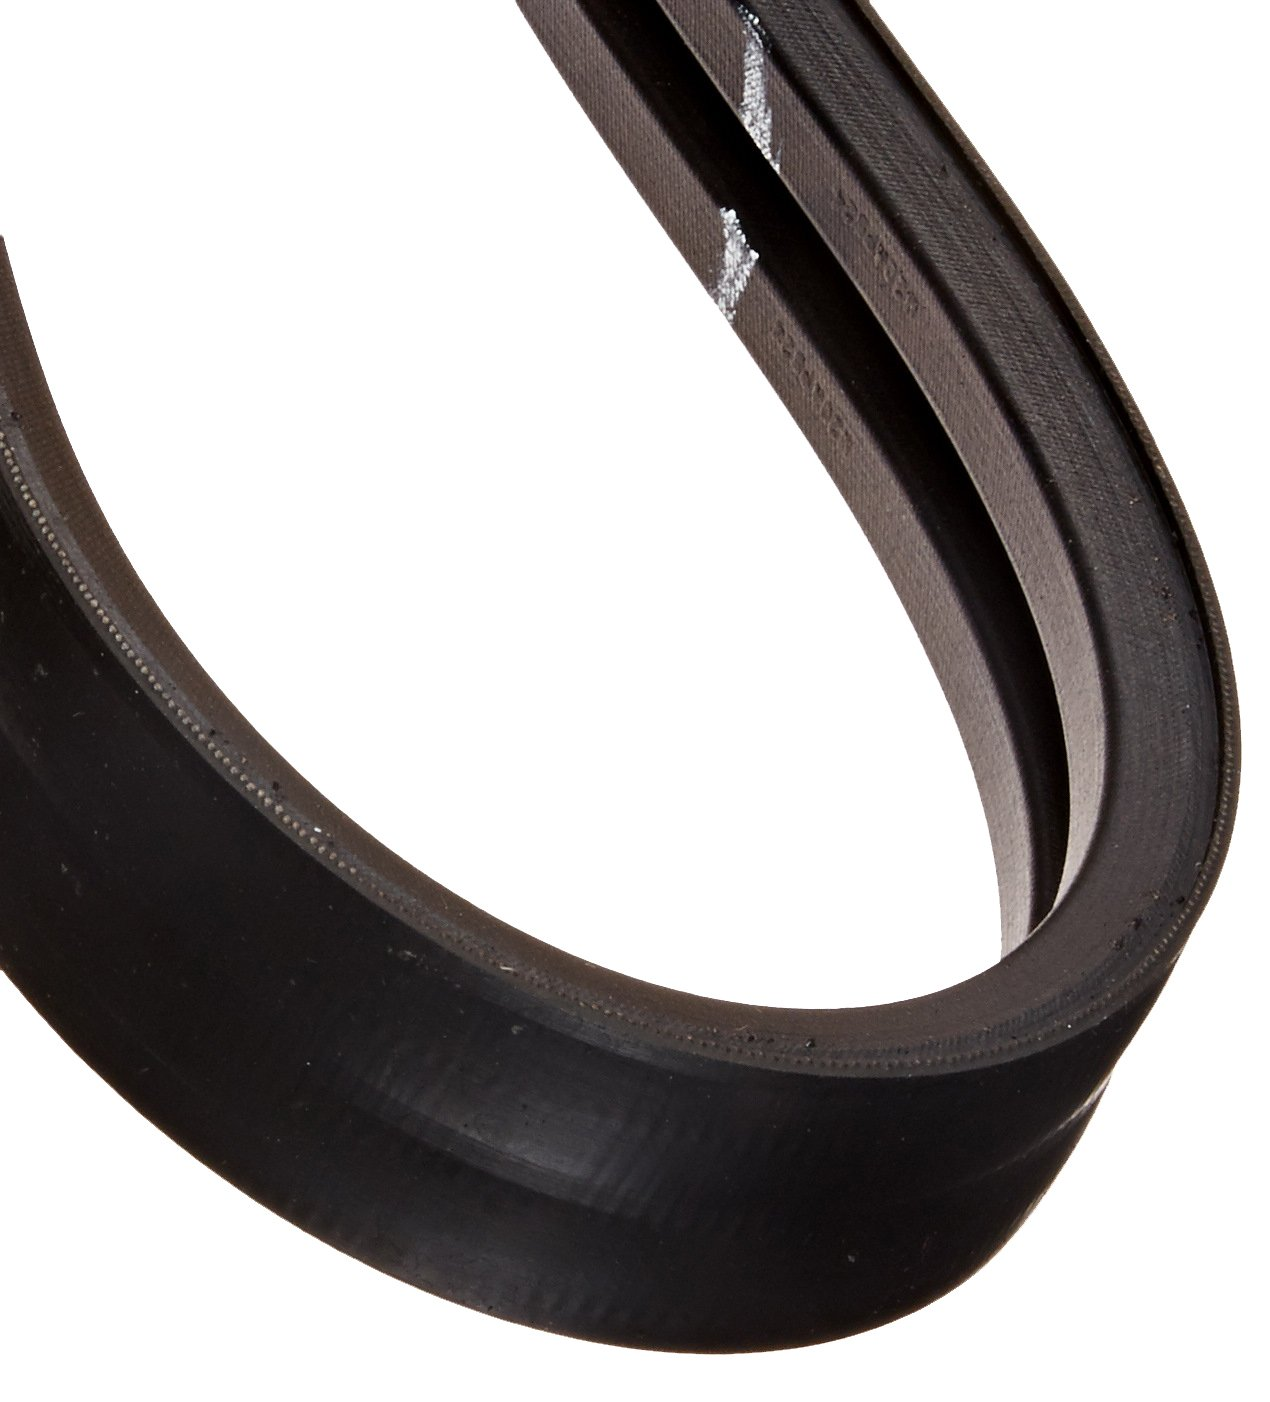 D/&D PowerDrive 816101C LAND PRIDE Replacement Belt 199 Length Rubber 199 Length OffRoad Belts C 1-Band